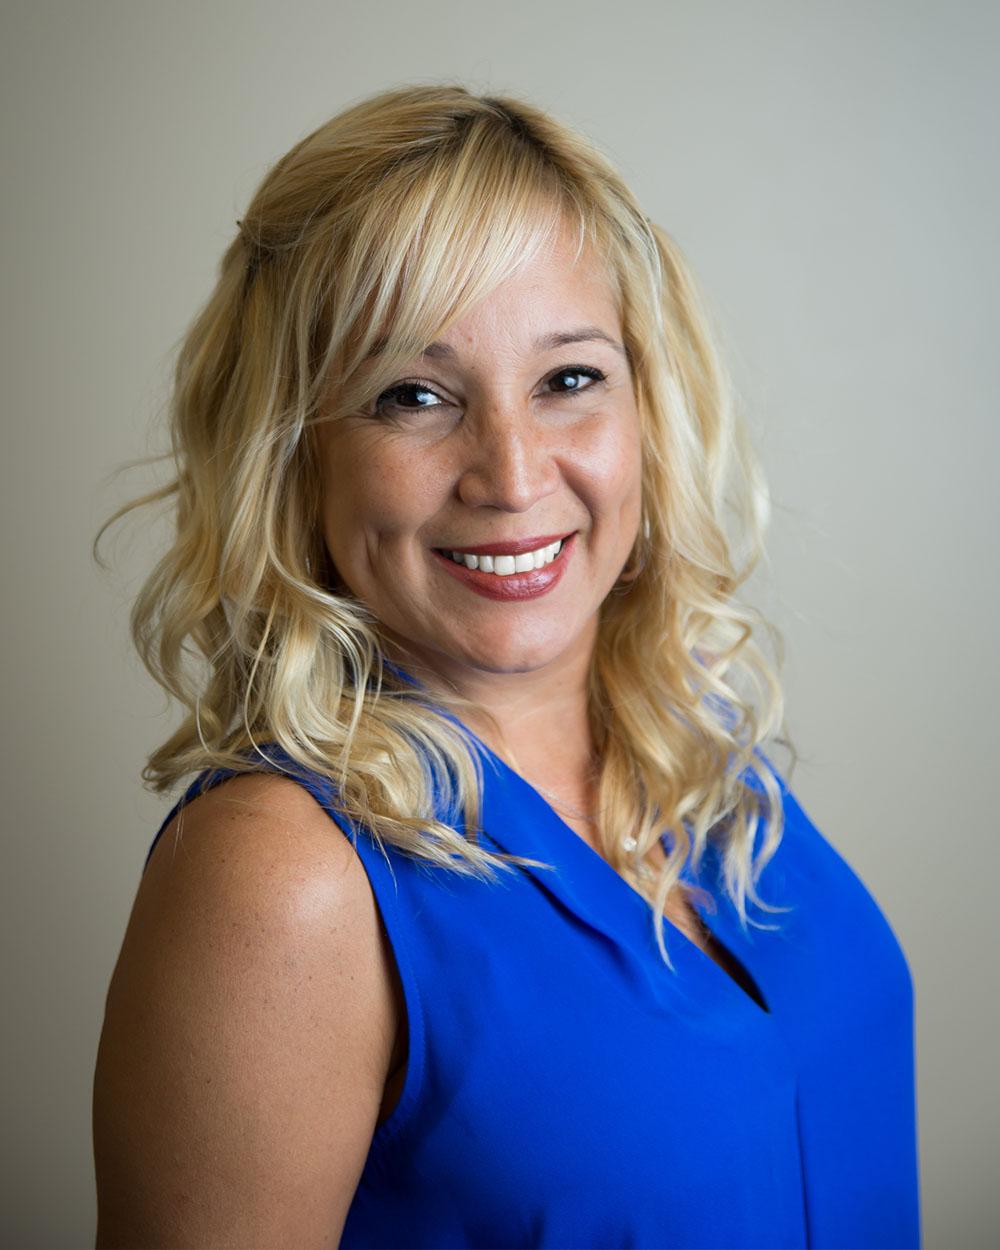 Nicole Carrasquillo